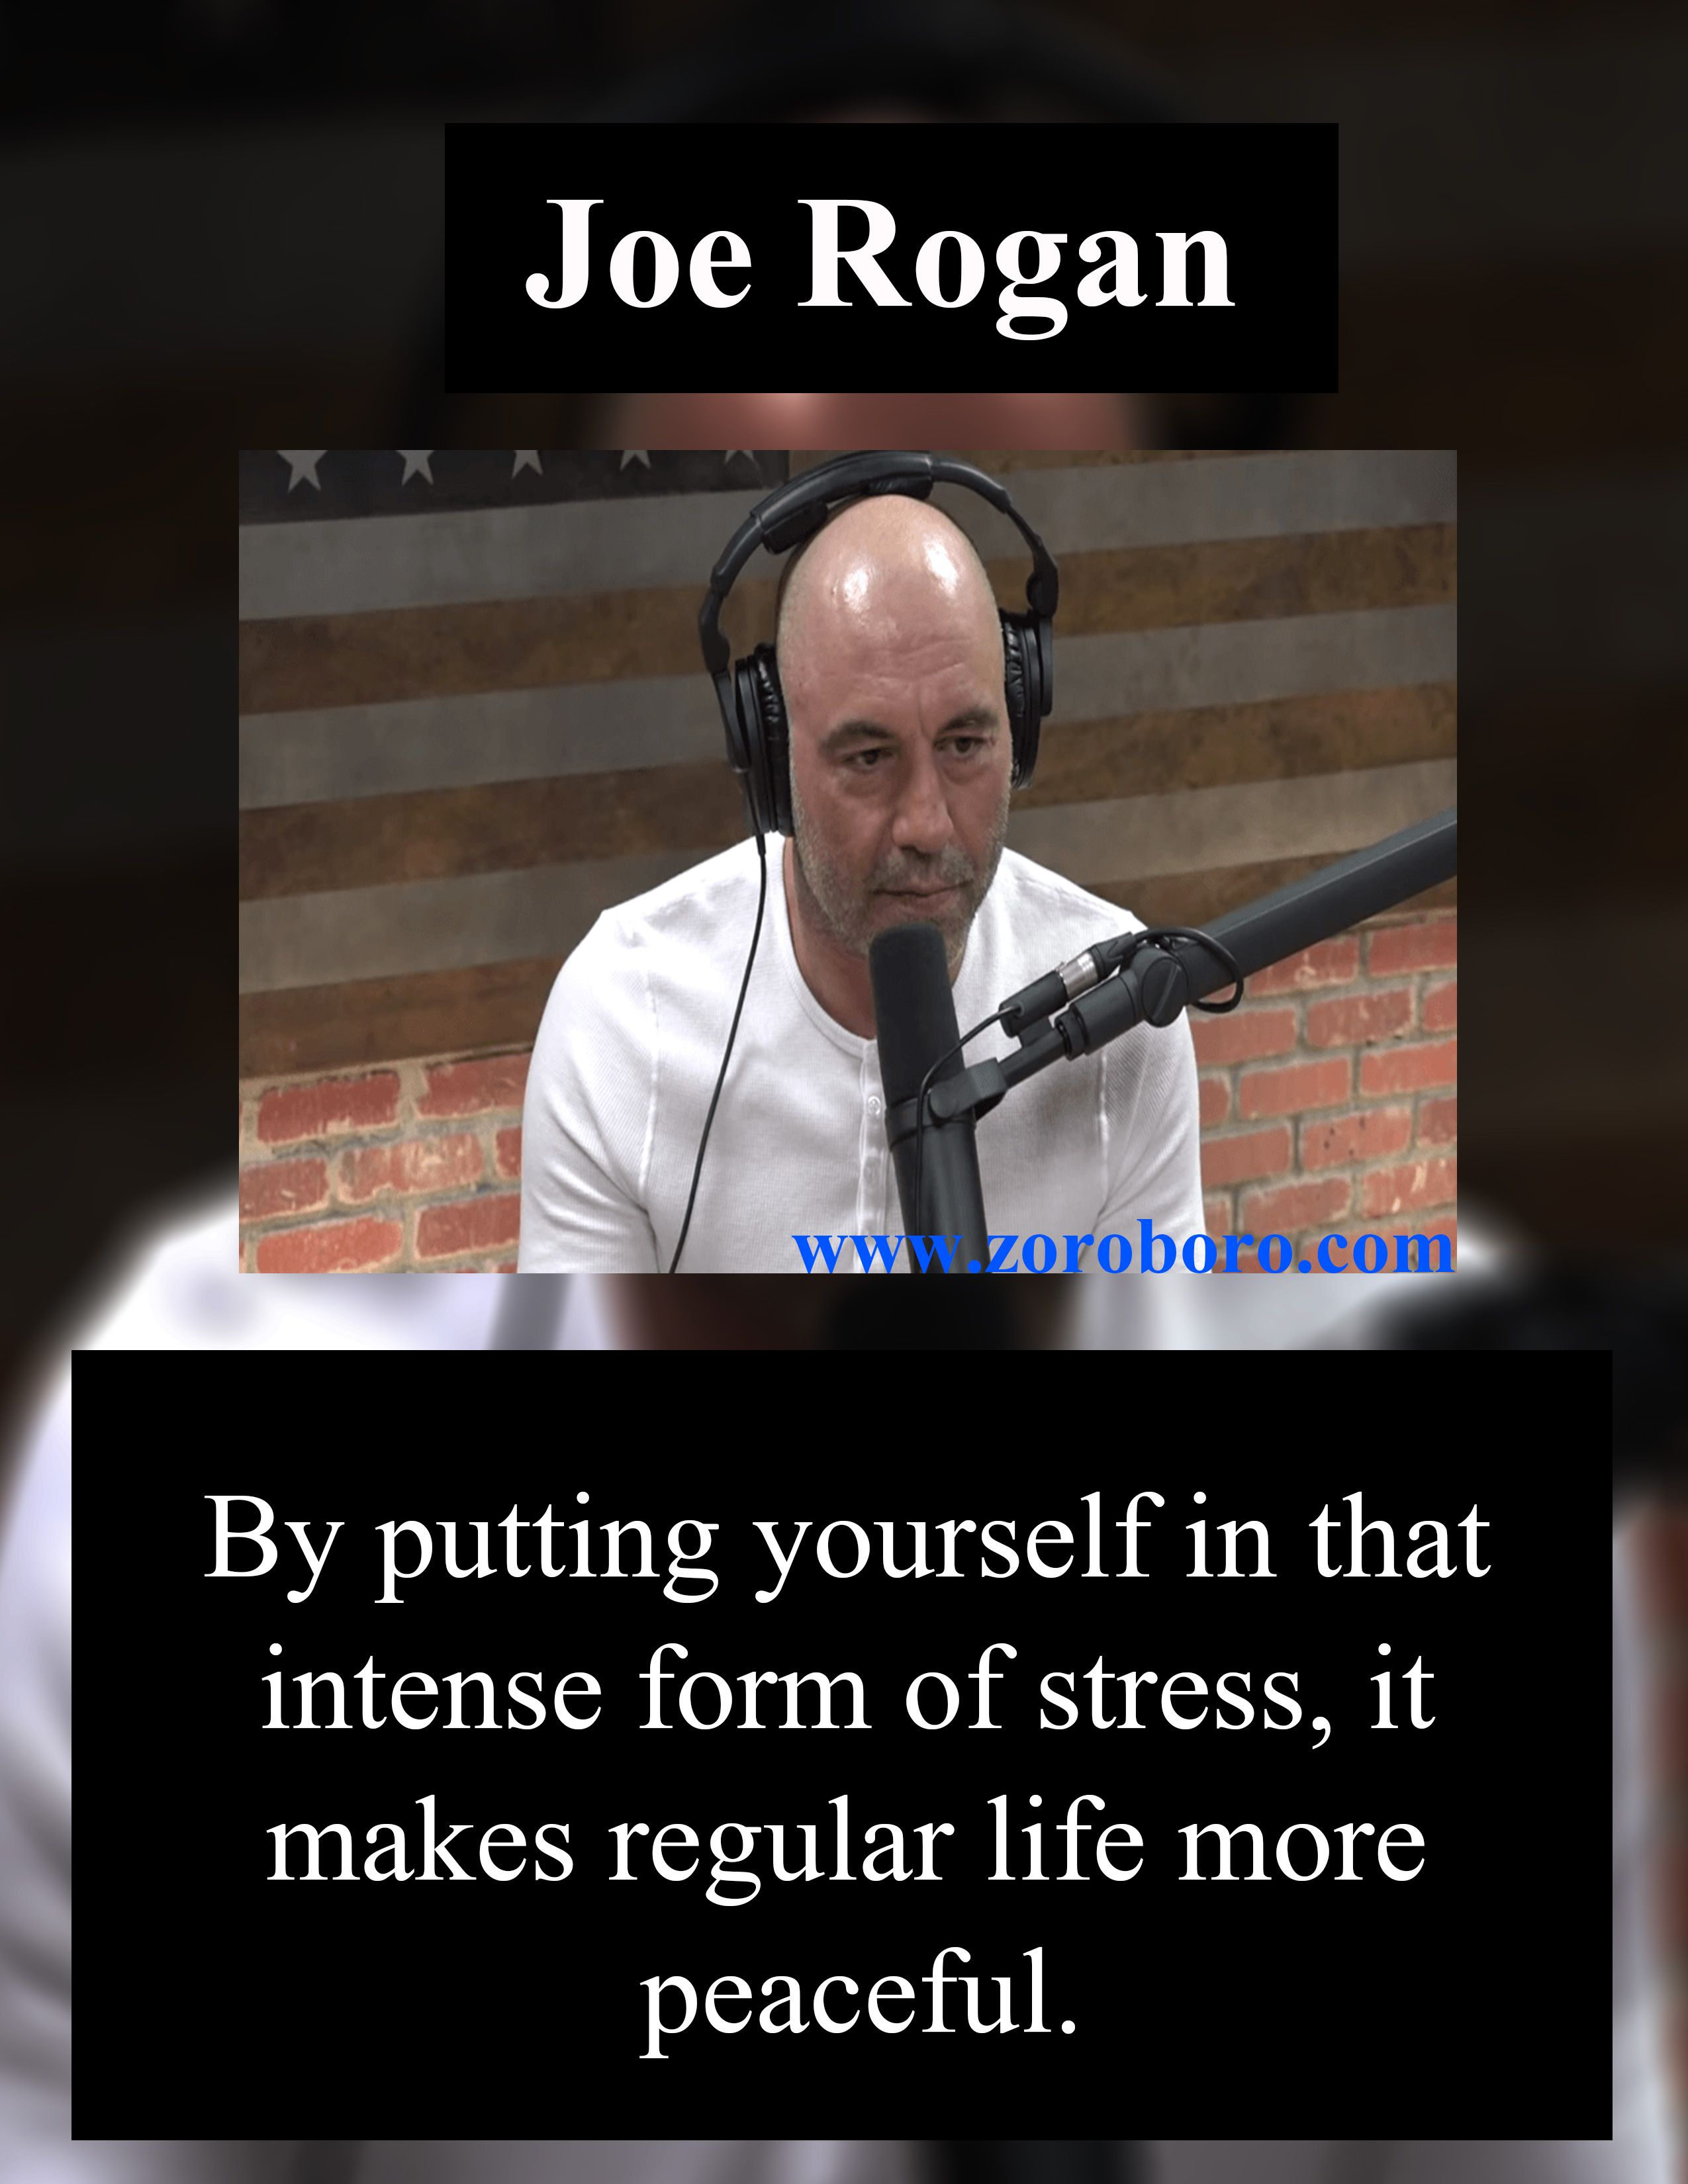 Joe Rogan Quotes Joe Rogan Podcast Quotes On Success Life Joe Rogan Inspirational Thoughts In 2020 Joe Rogan Quotes Success Quotes Inspirational Thoughts